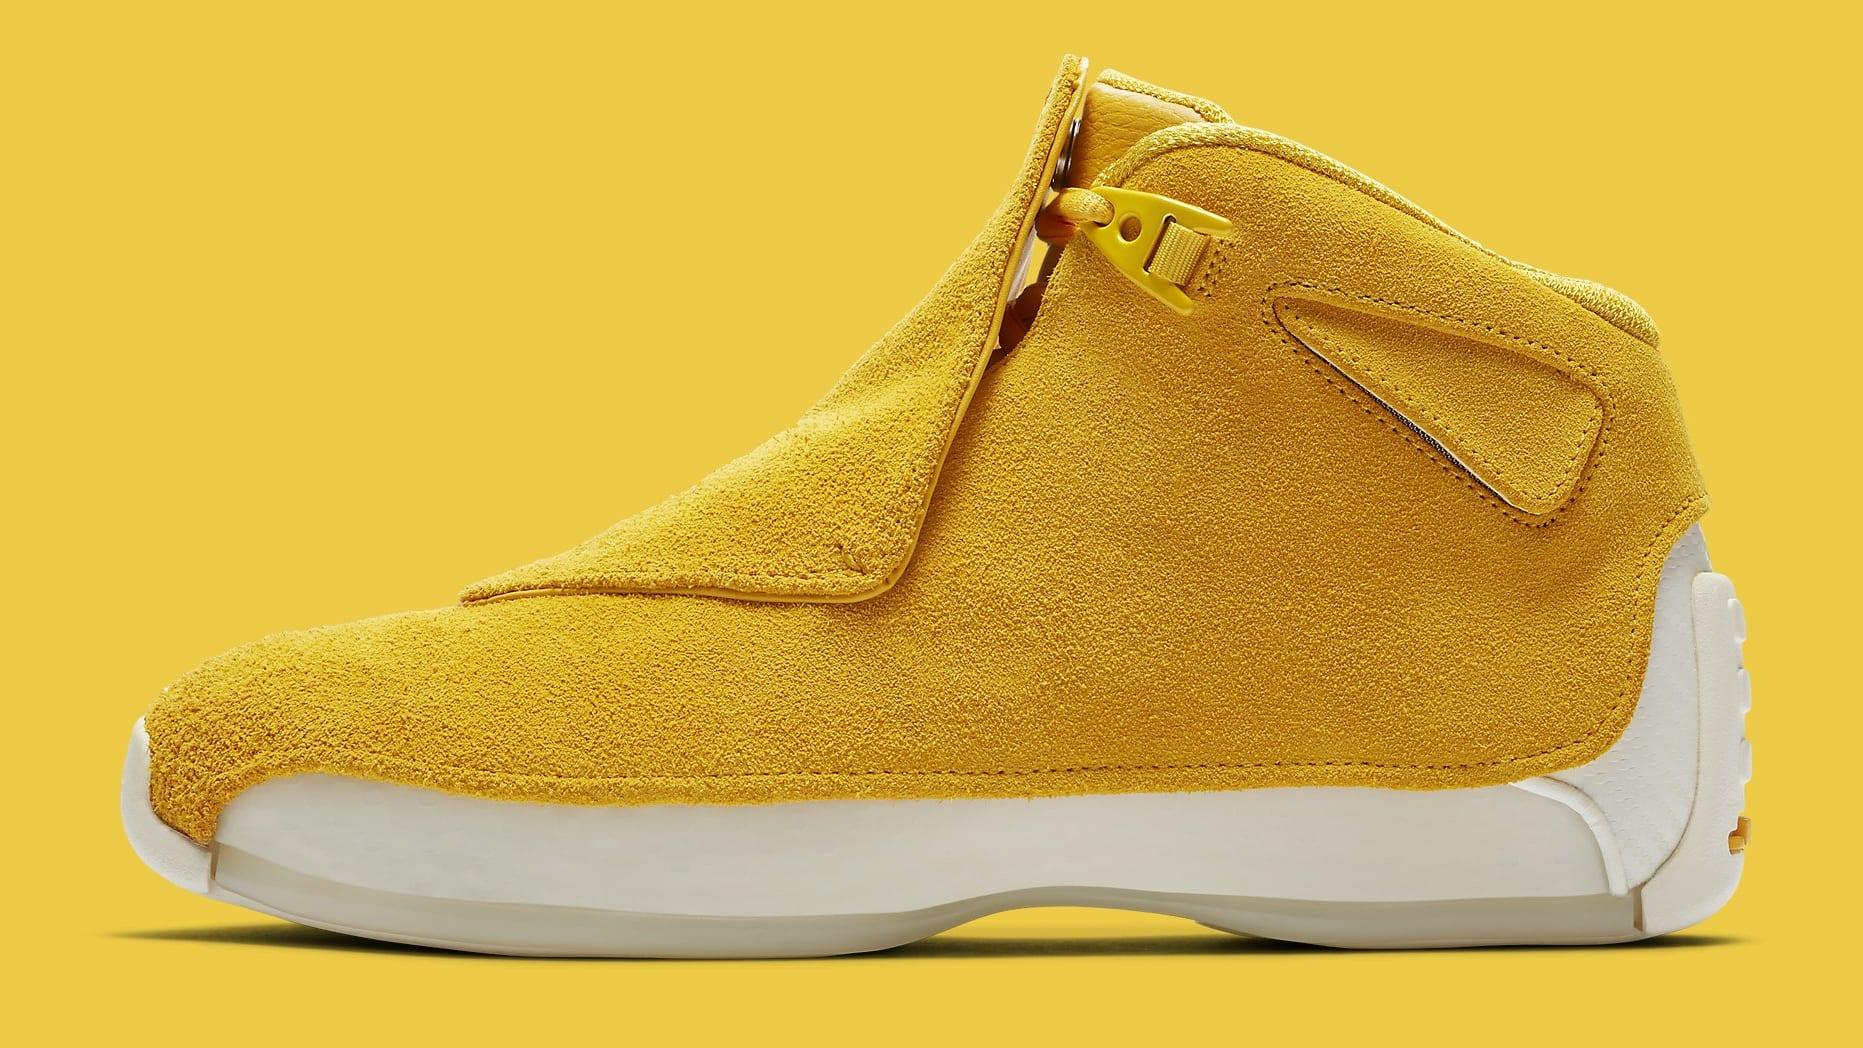 air-jordan-18-yellow-ochre-release-date-aa2494-701-profile